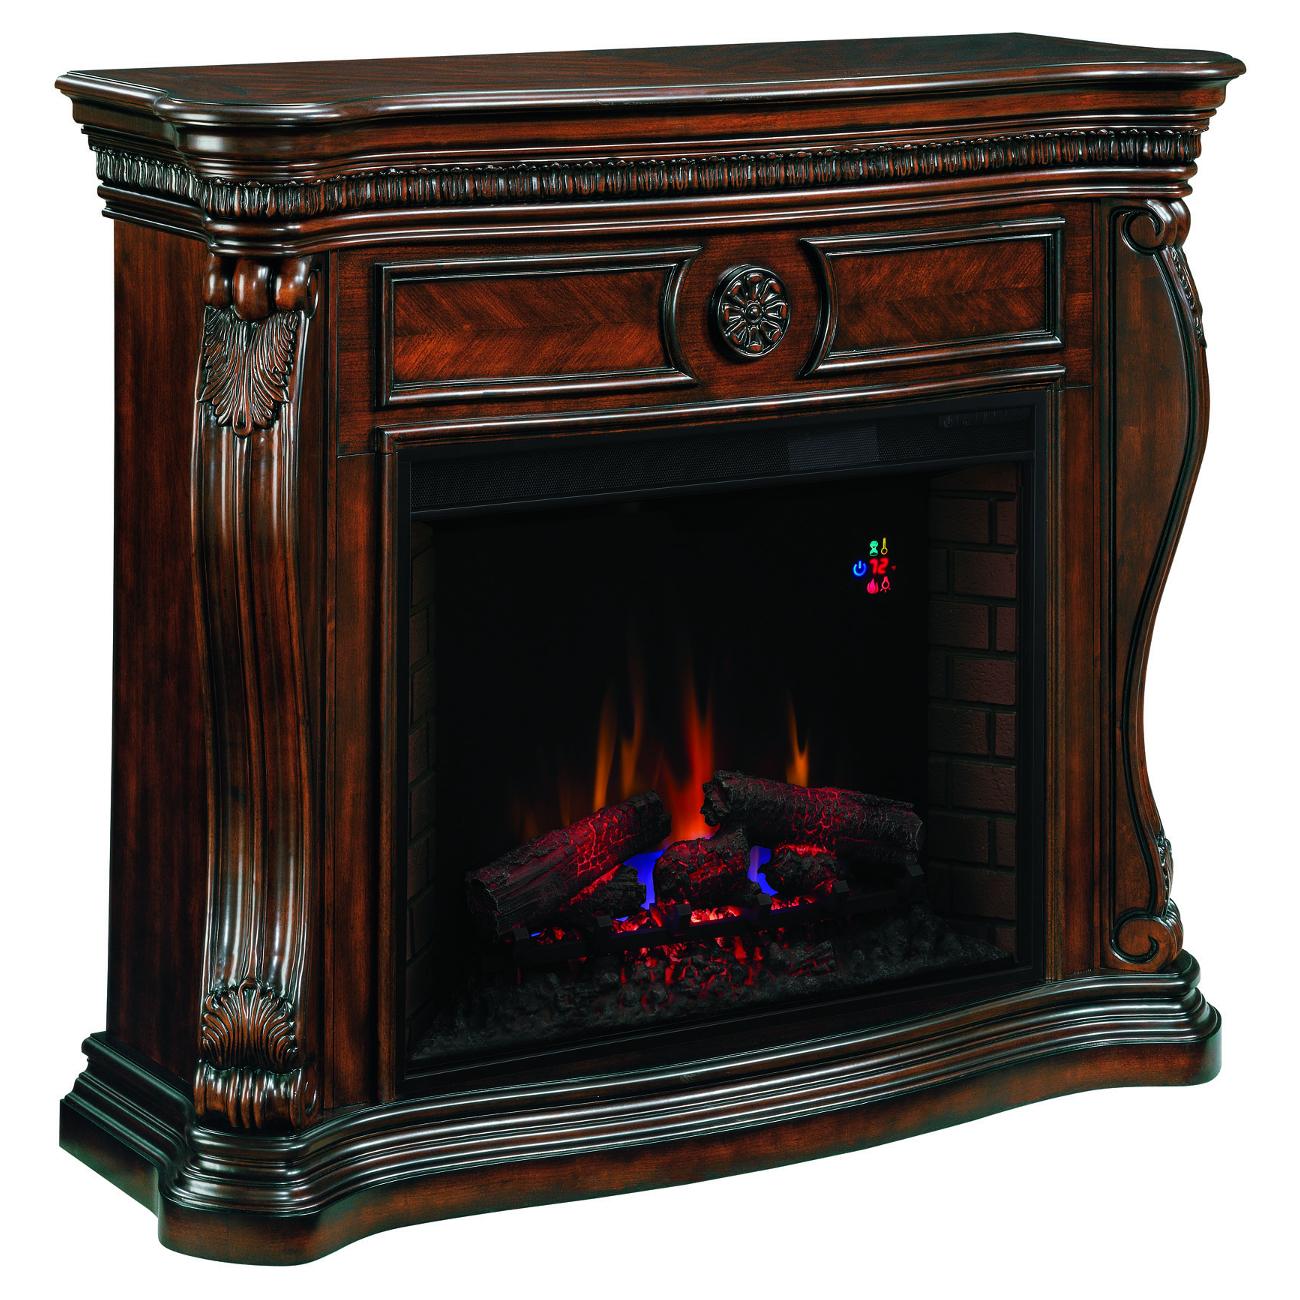 classic-flame-Lexington-electric-fireplace-33WM881-C232